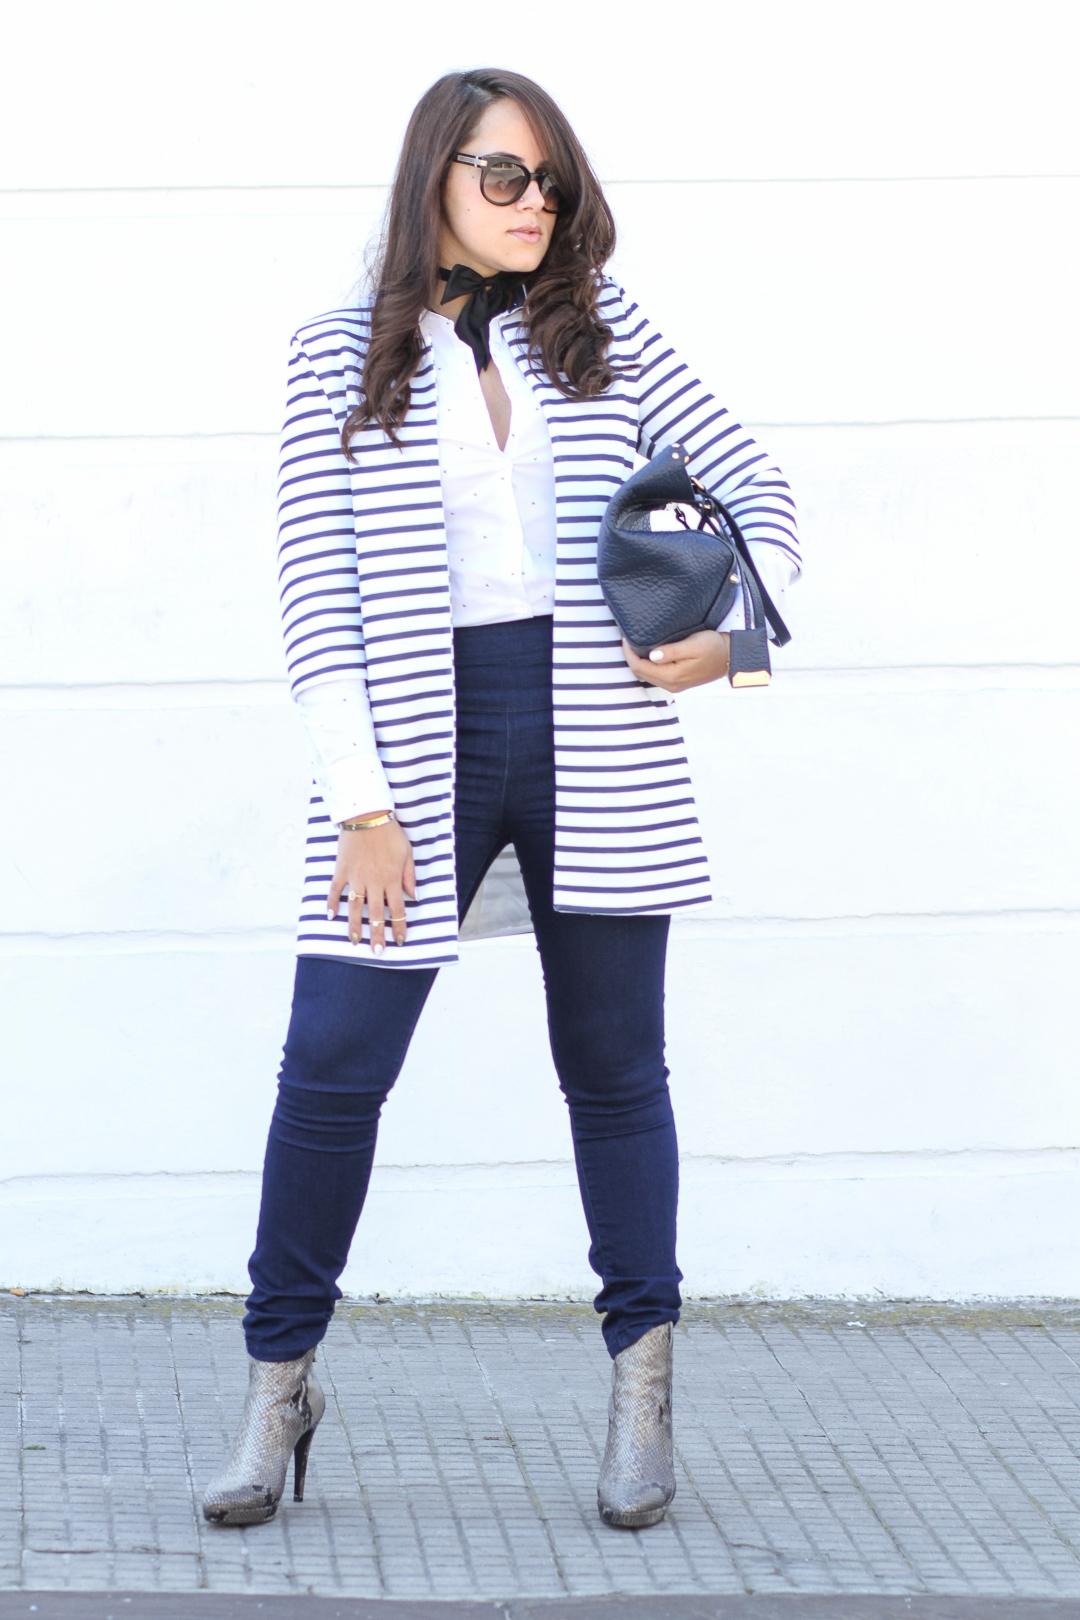 La-veste-rayée-blog-mode-chiccarpediem-1